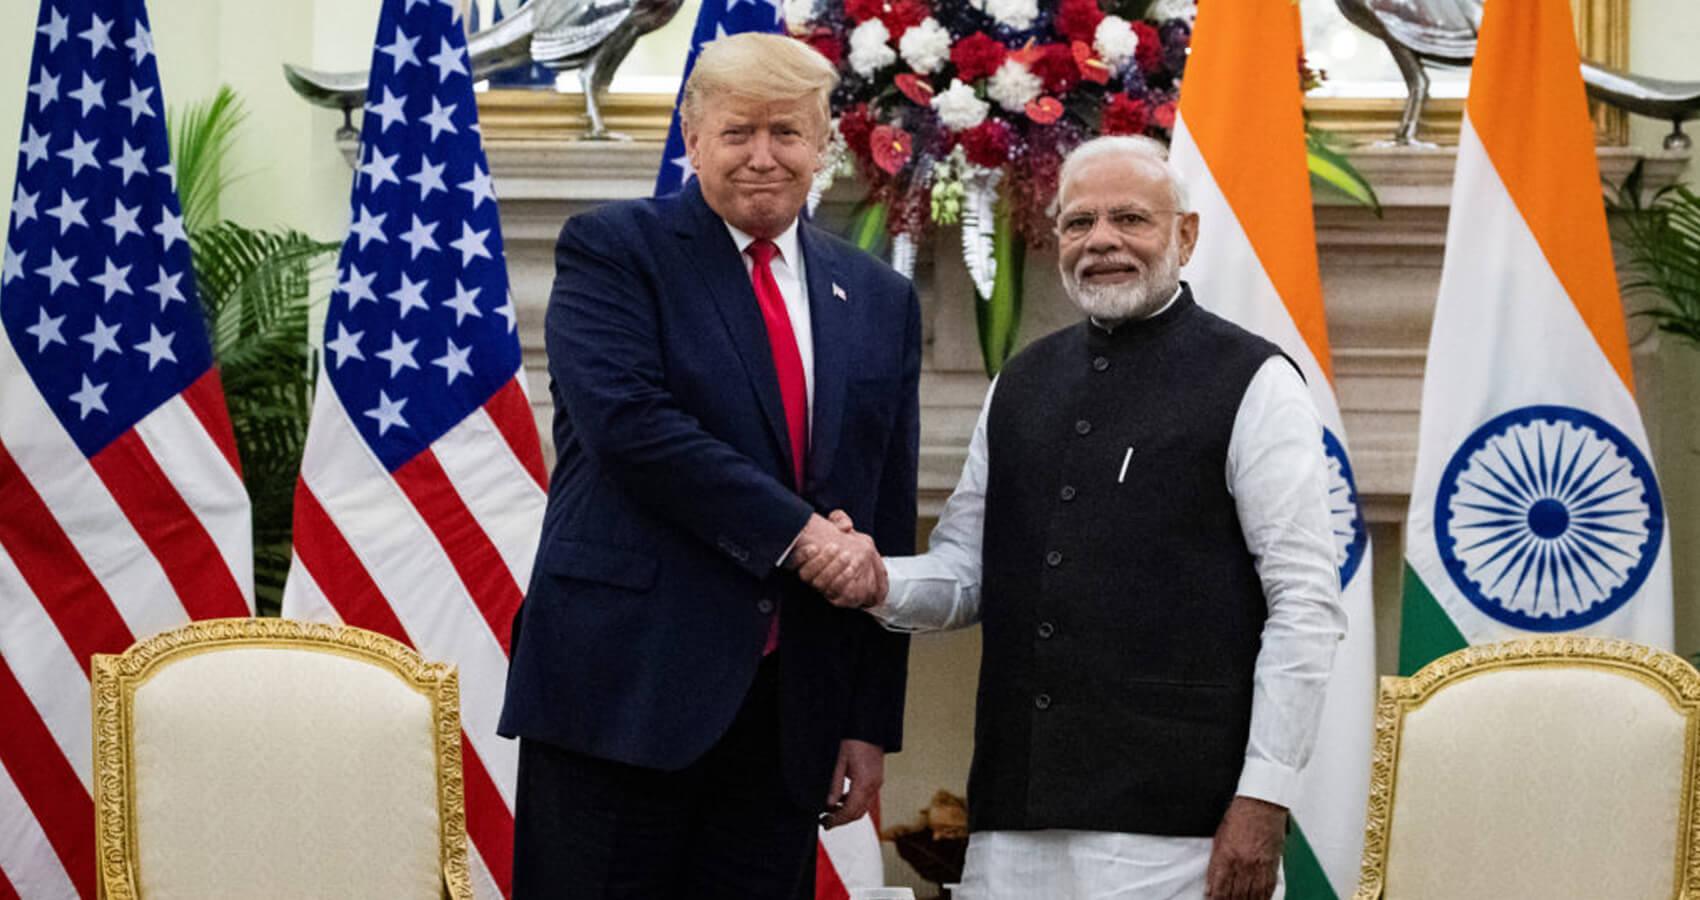 Trump-Honors-Modi-With-Legion-of-Merit-Award